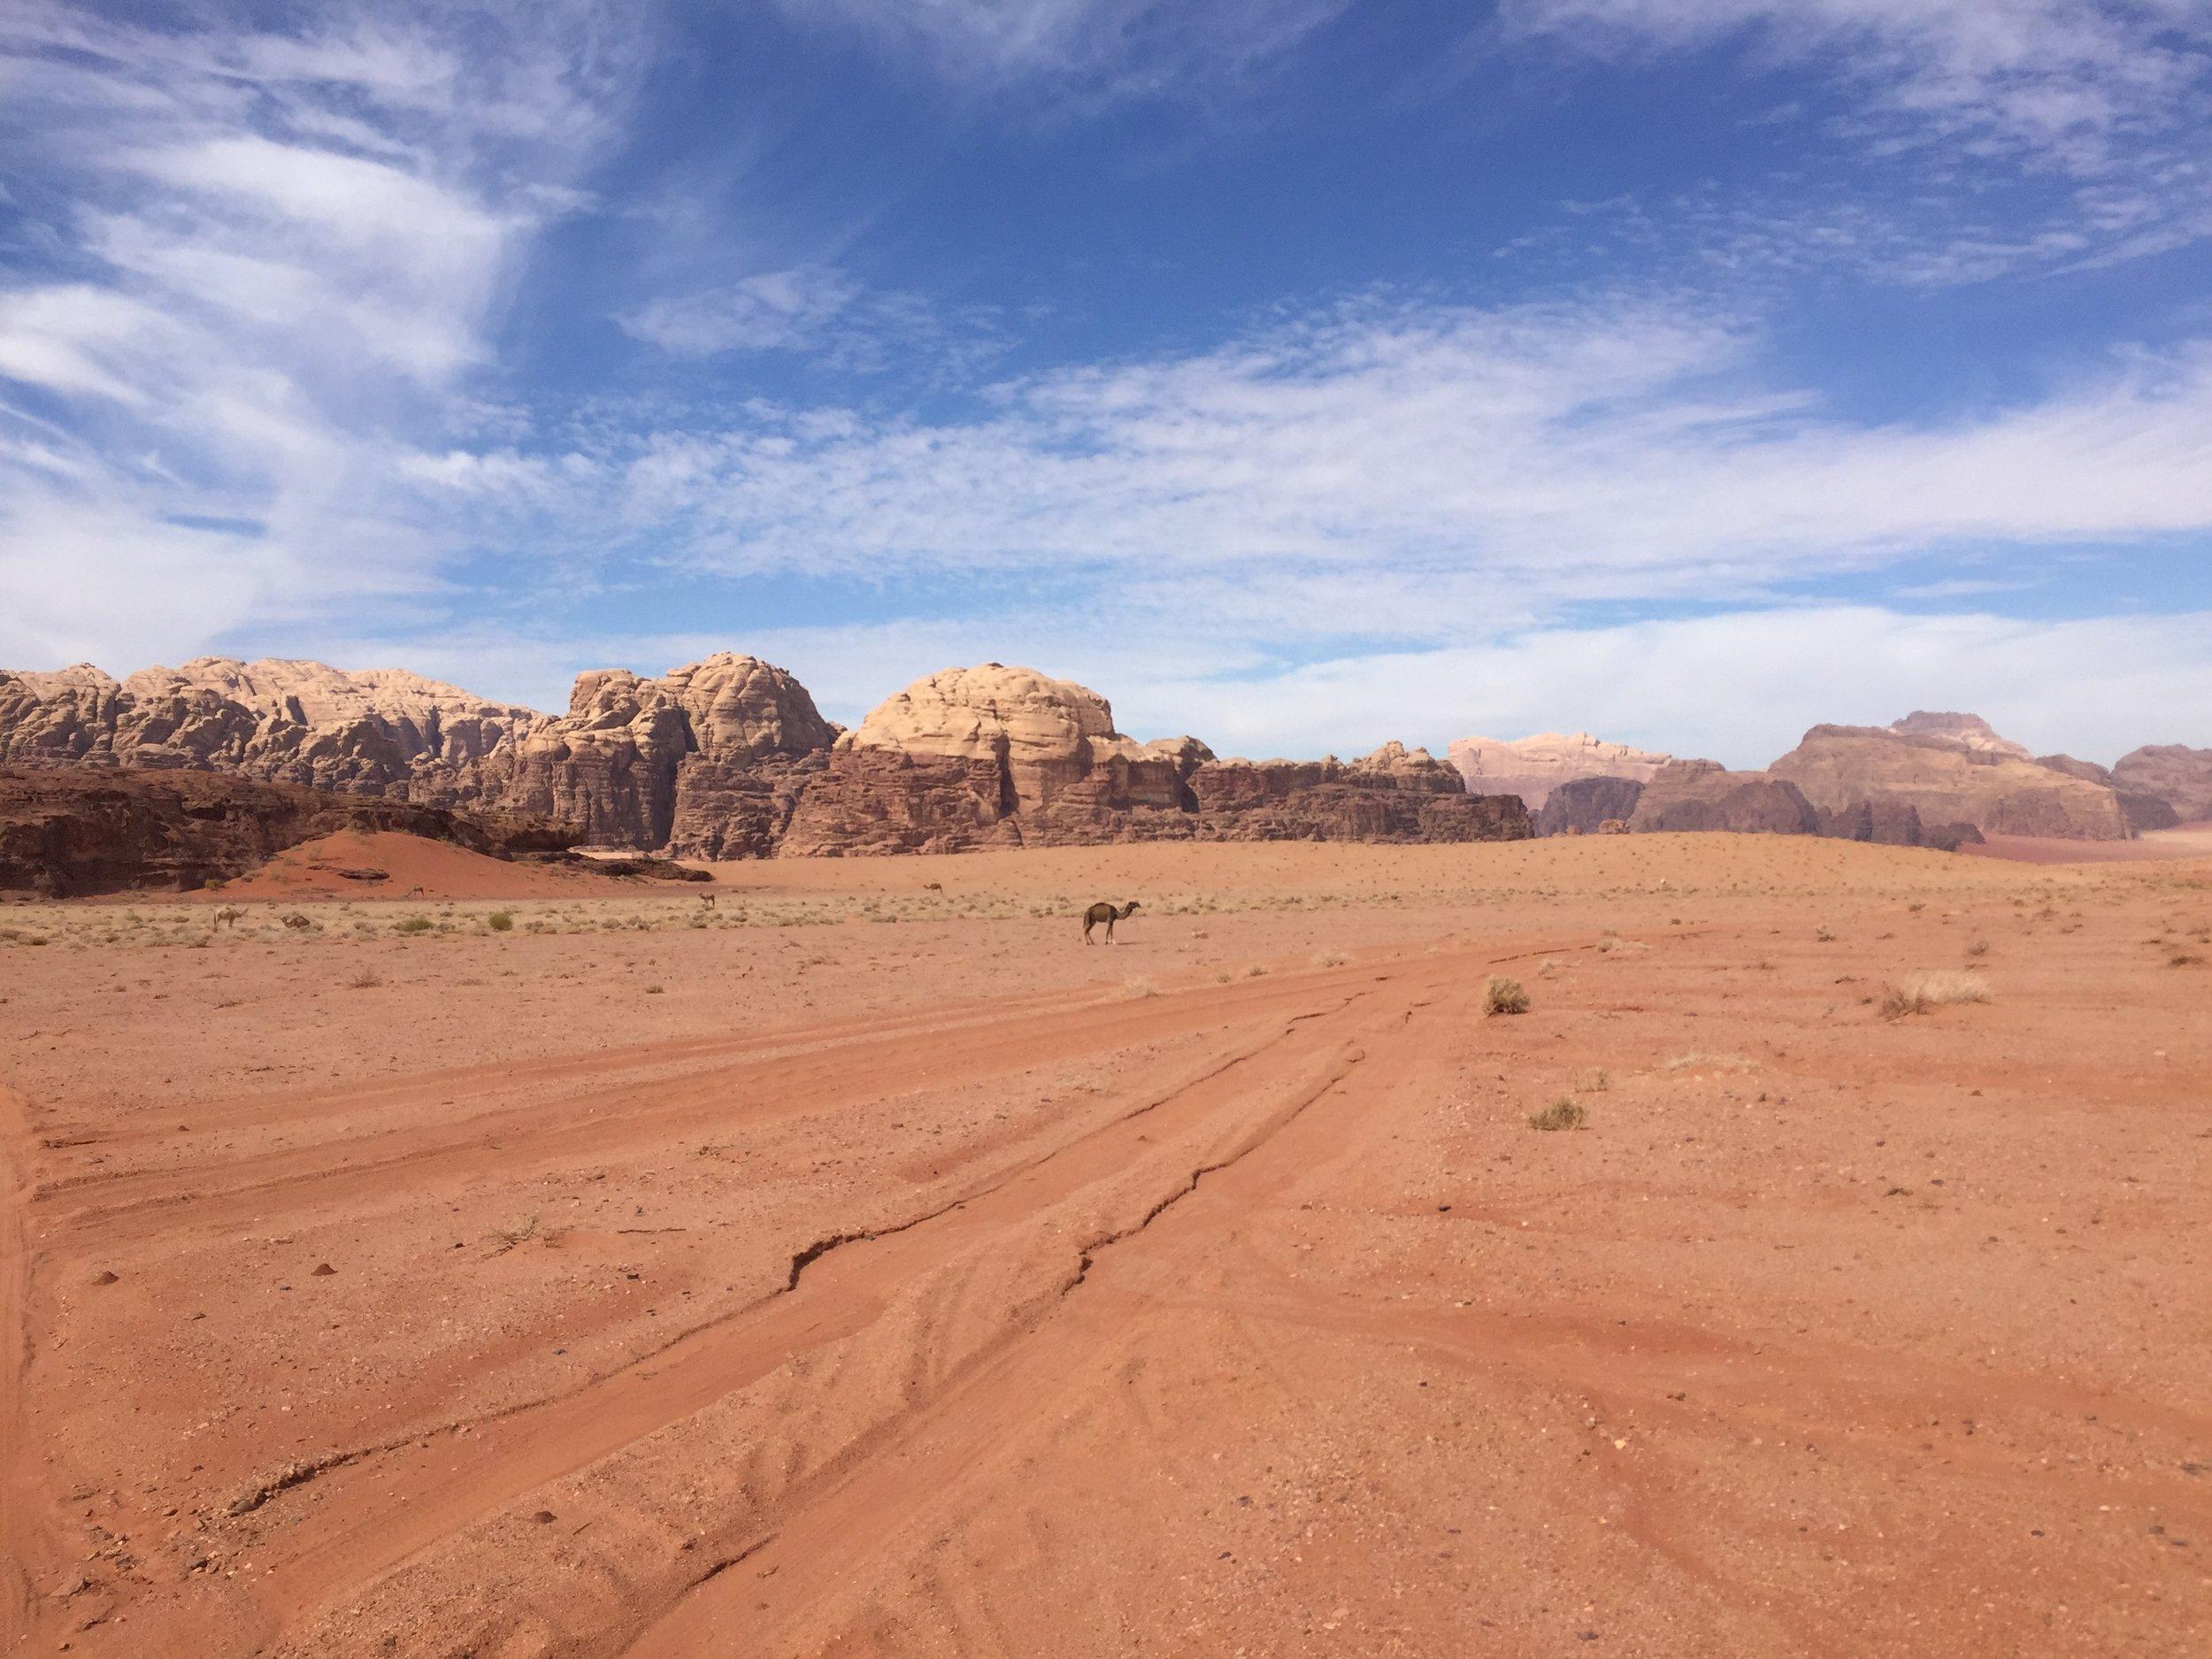 Camels roaming free in Wadi Rum